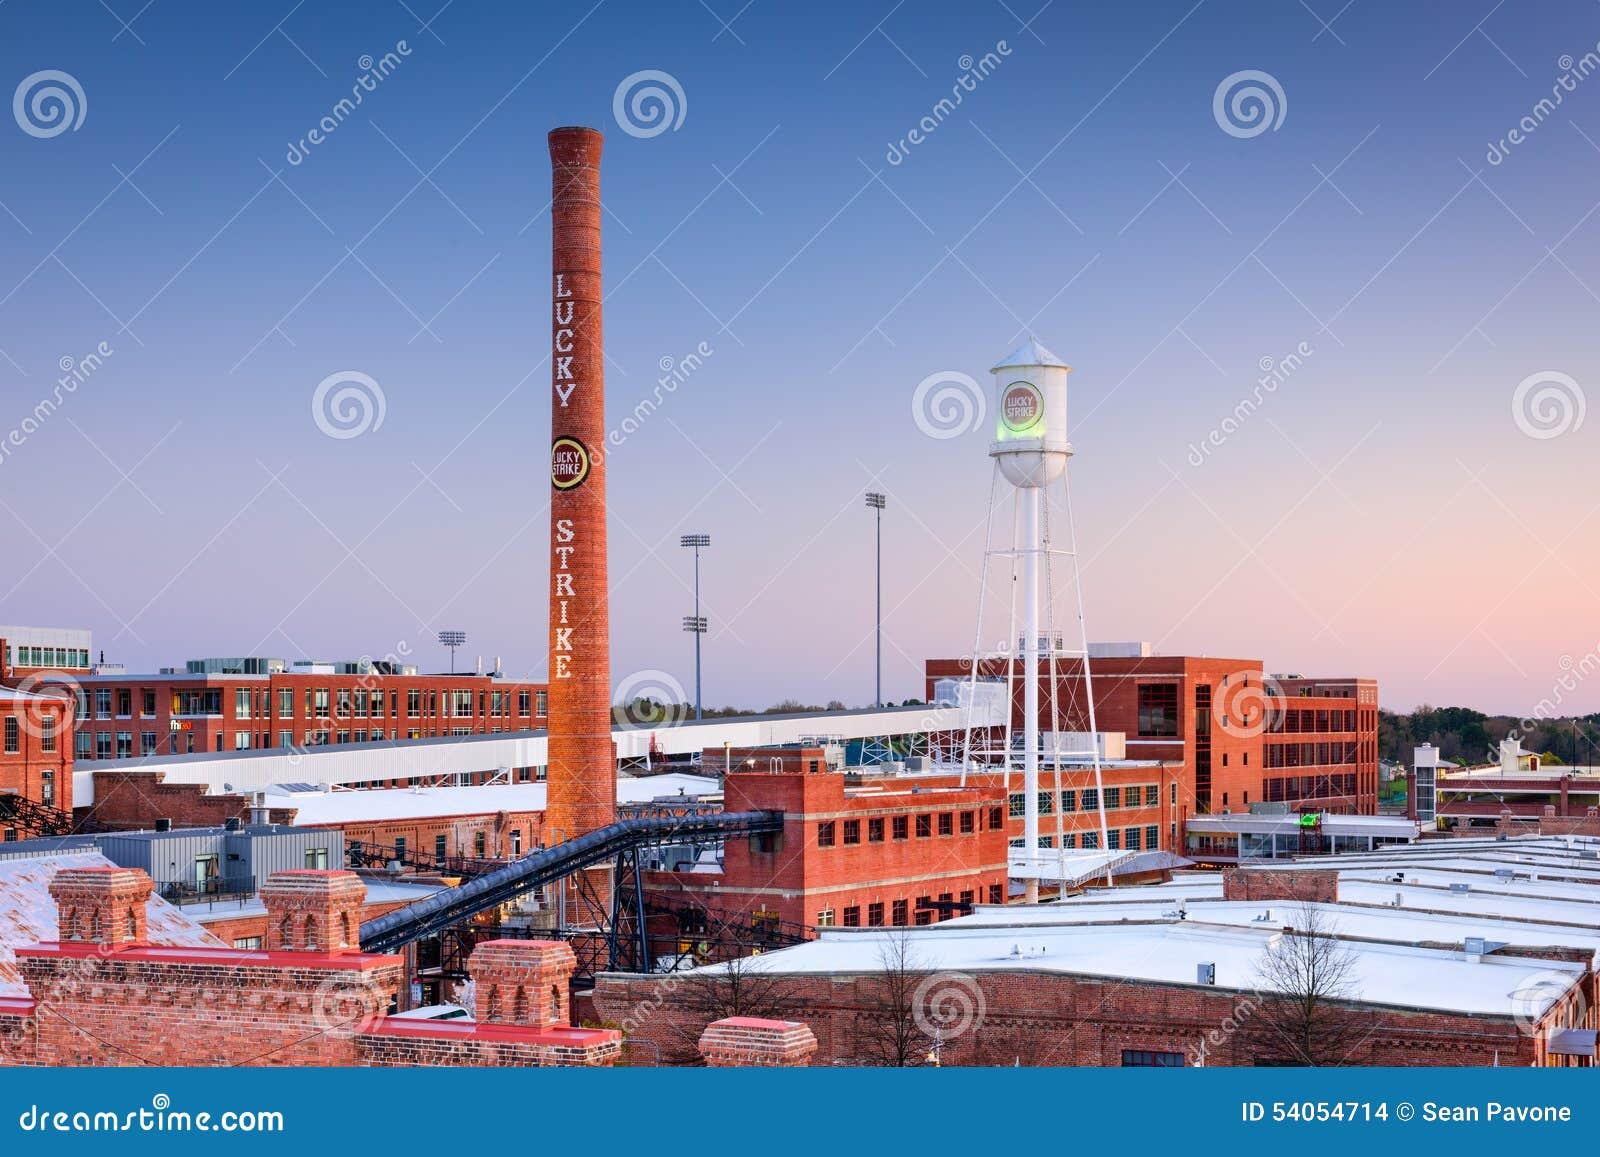 Durham Skyline Editorial Stock Image Image Of Hill Historic 54054714